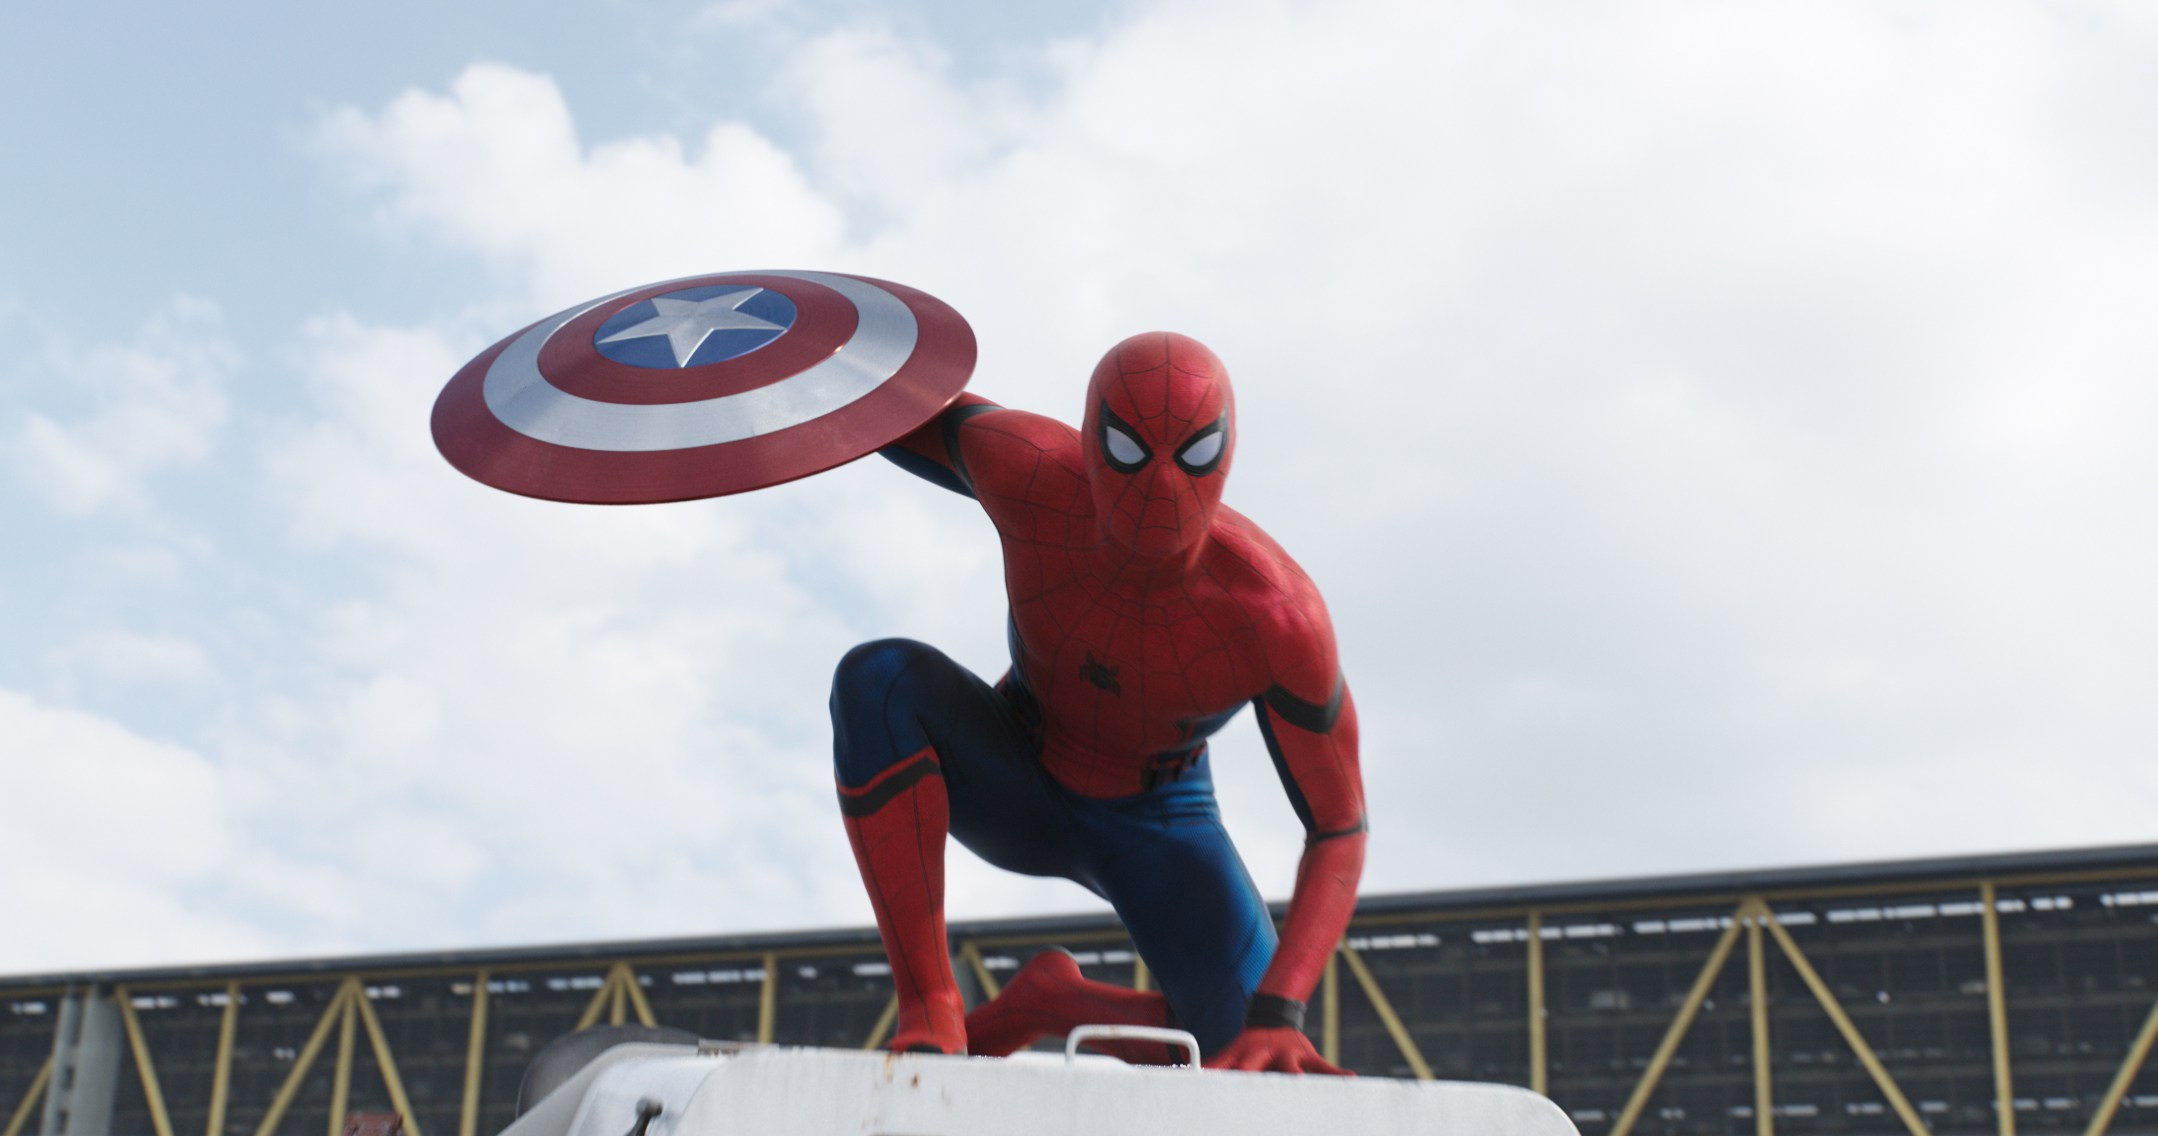 https://cinemaplanet.pt/wp-content/uploads/2016/04/Captain-America-Civil-War-Spider-Man-Shield-Official.jpg